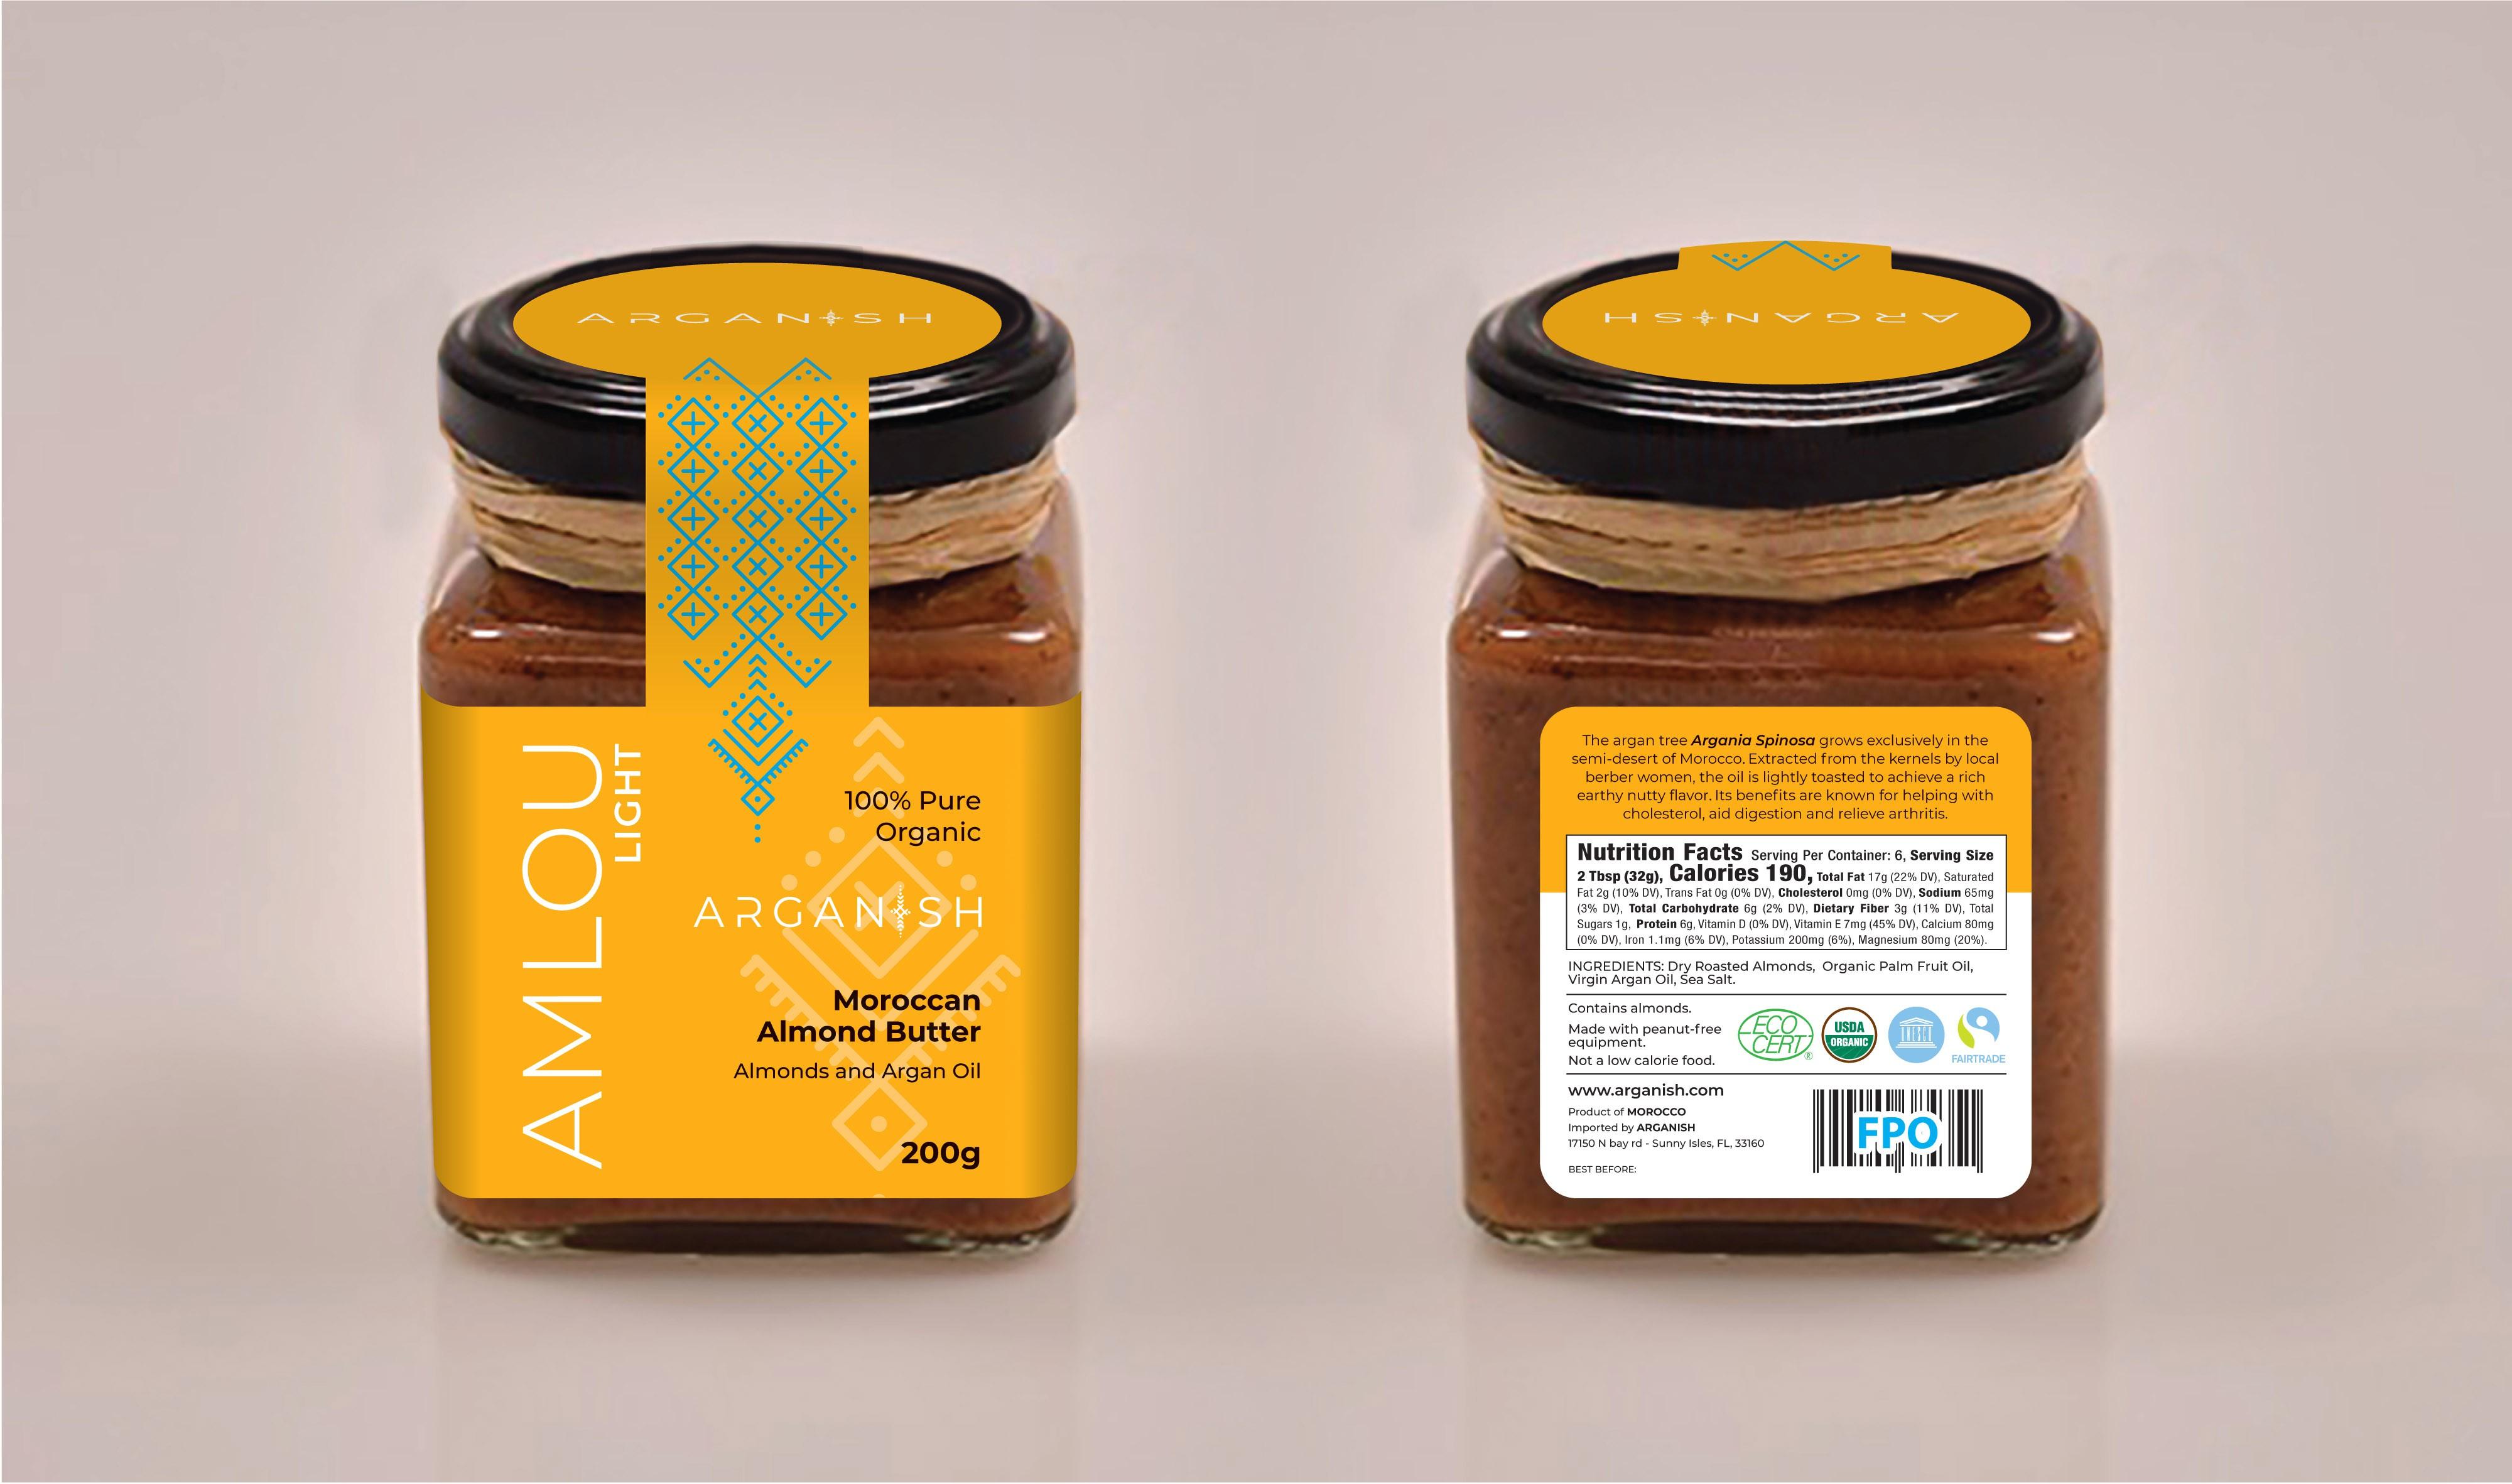 ARGANISH - Label for Little Jar